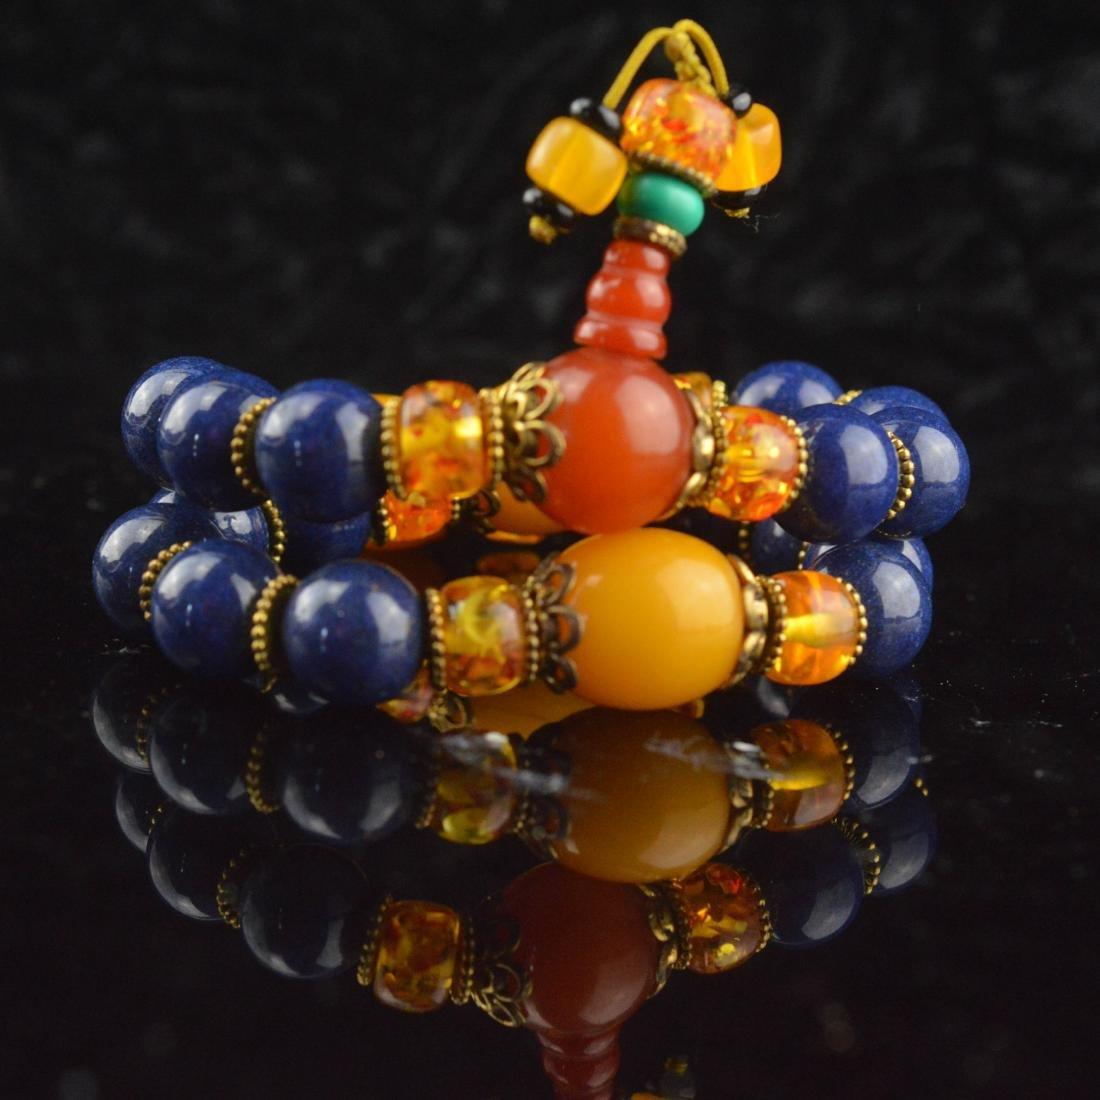 Lapis Lazuli & Amber Bead Wrist Bracelet - 6